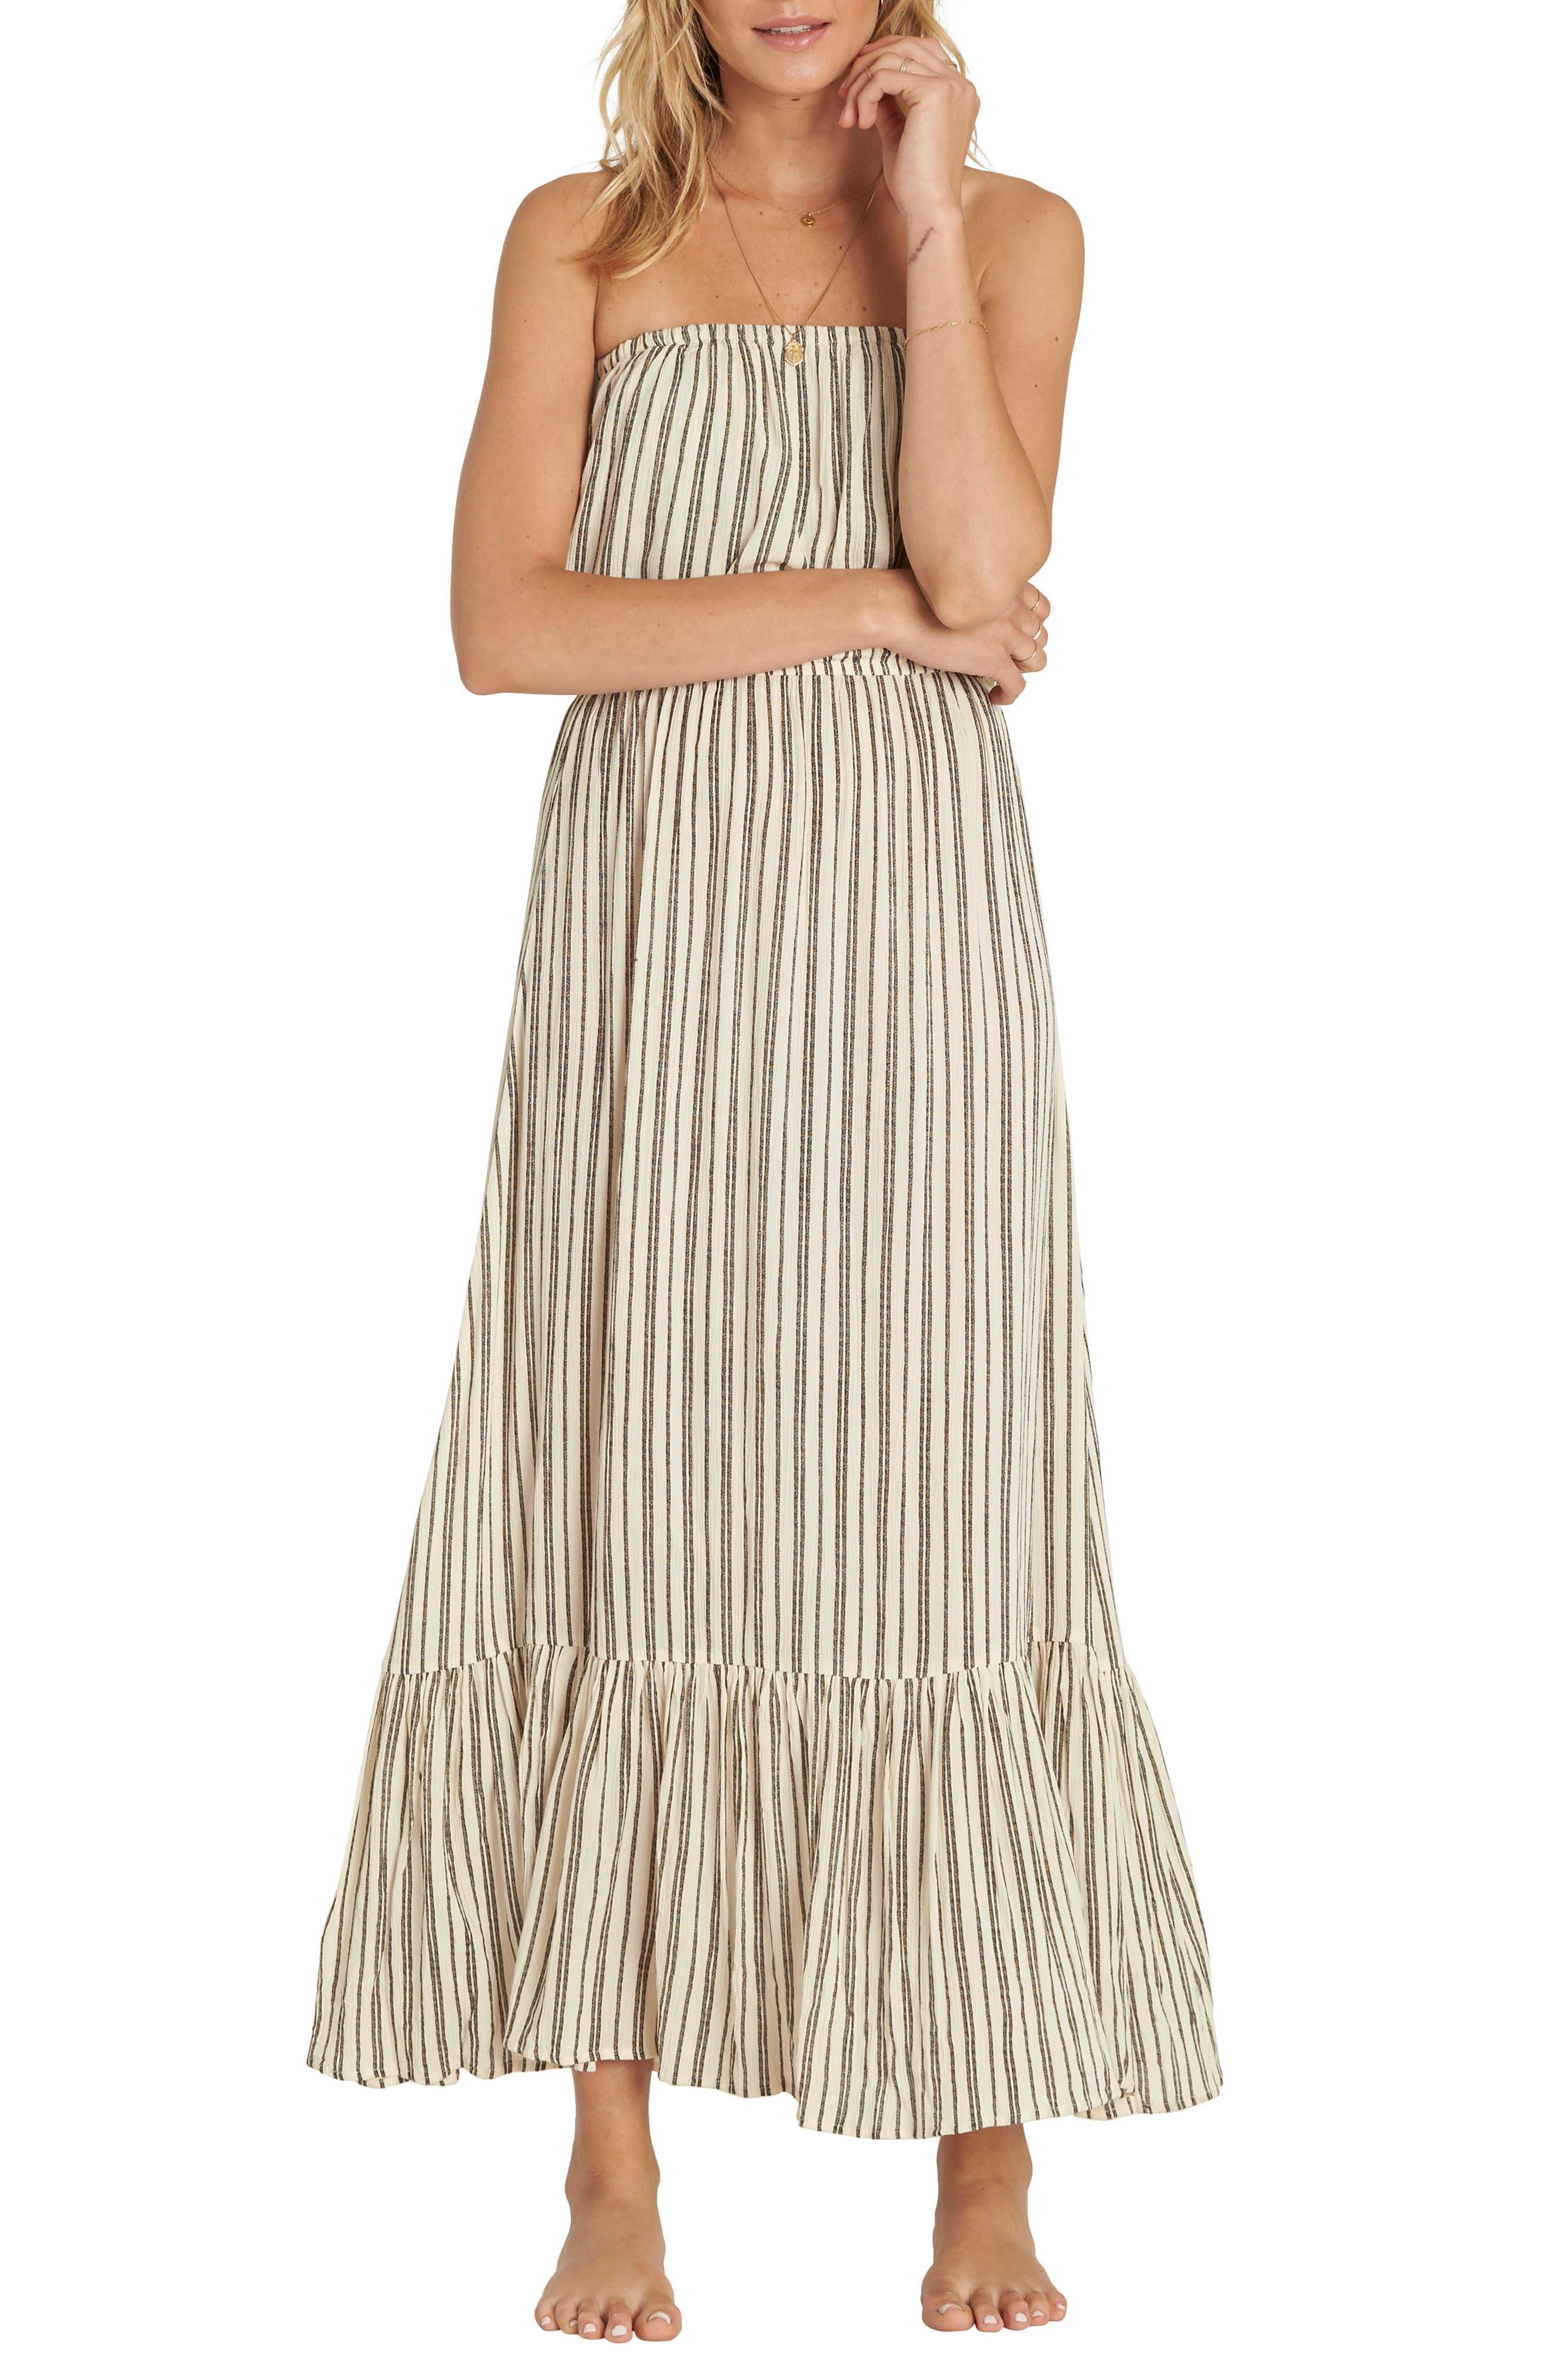 Island Vibes Strapless Maxi Dress,                             Main thumbnail 1, color,                             White Cap